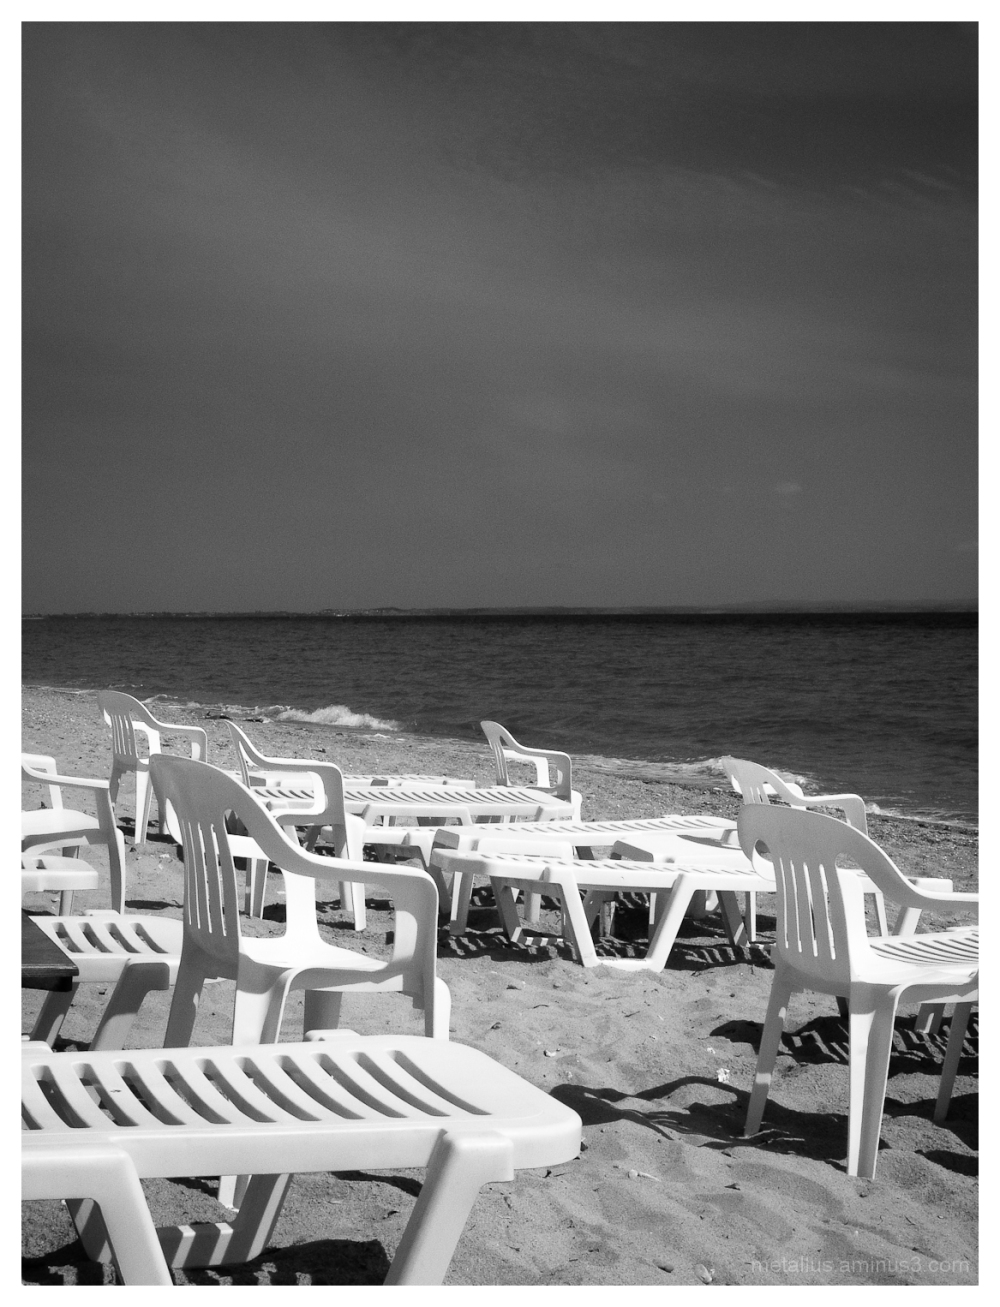 Beach chairs at Flogita, Chalkidiki, Greece 2004